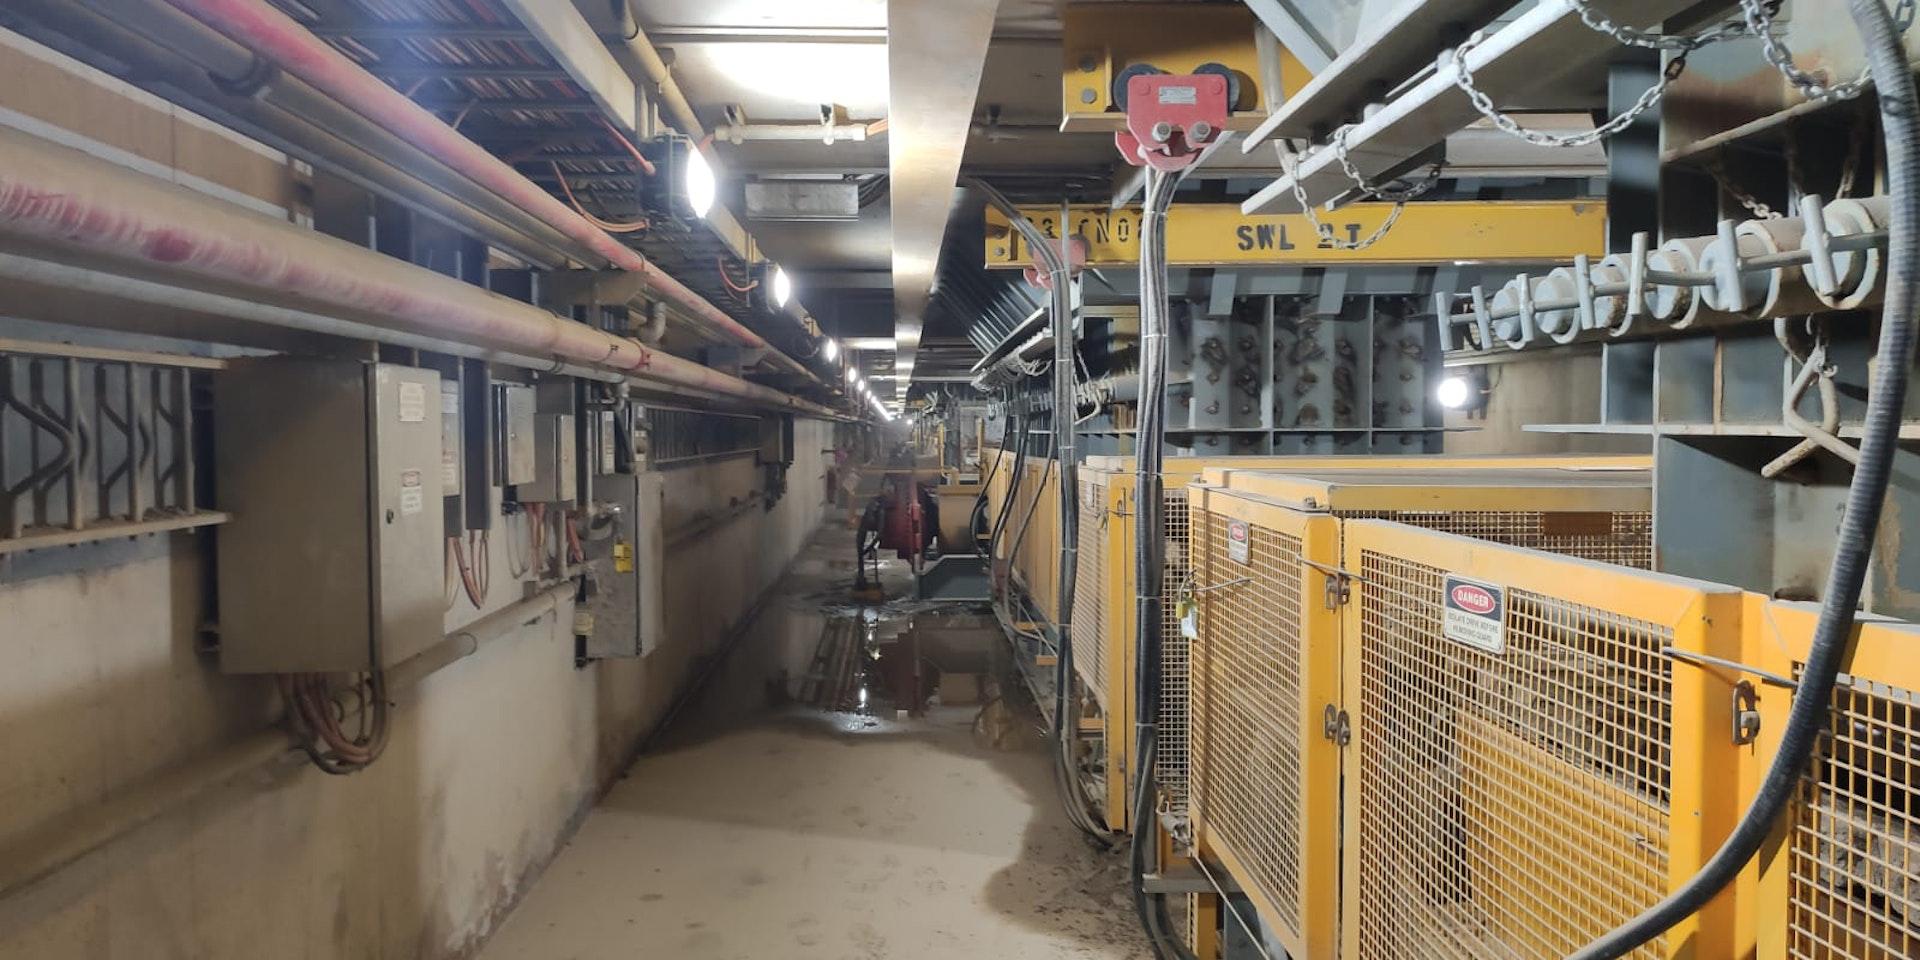 Emergency Bulkhead / Bulkhead LED light in application, installed in an industrial / mining conveyor tunnel